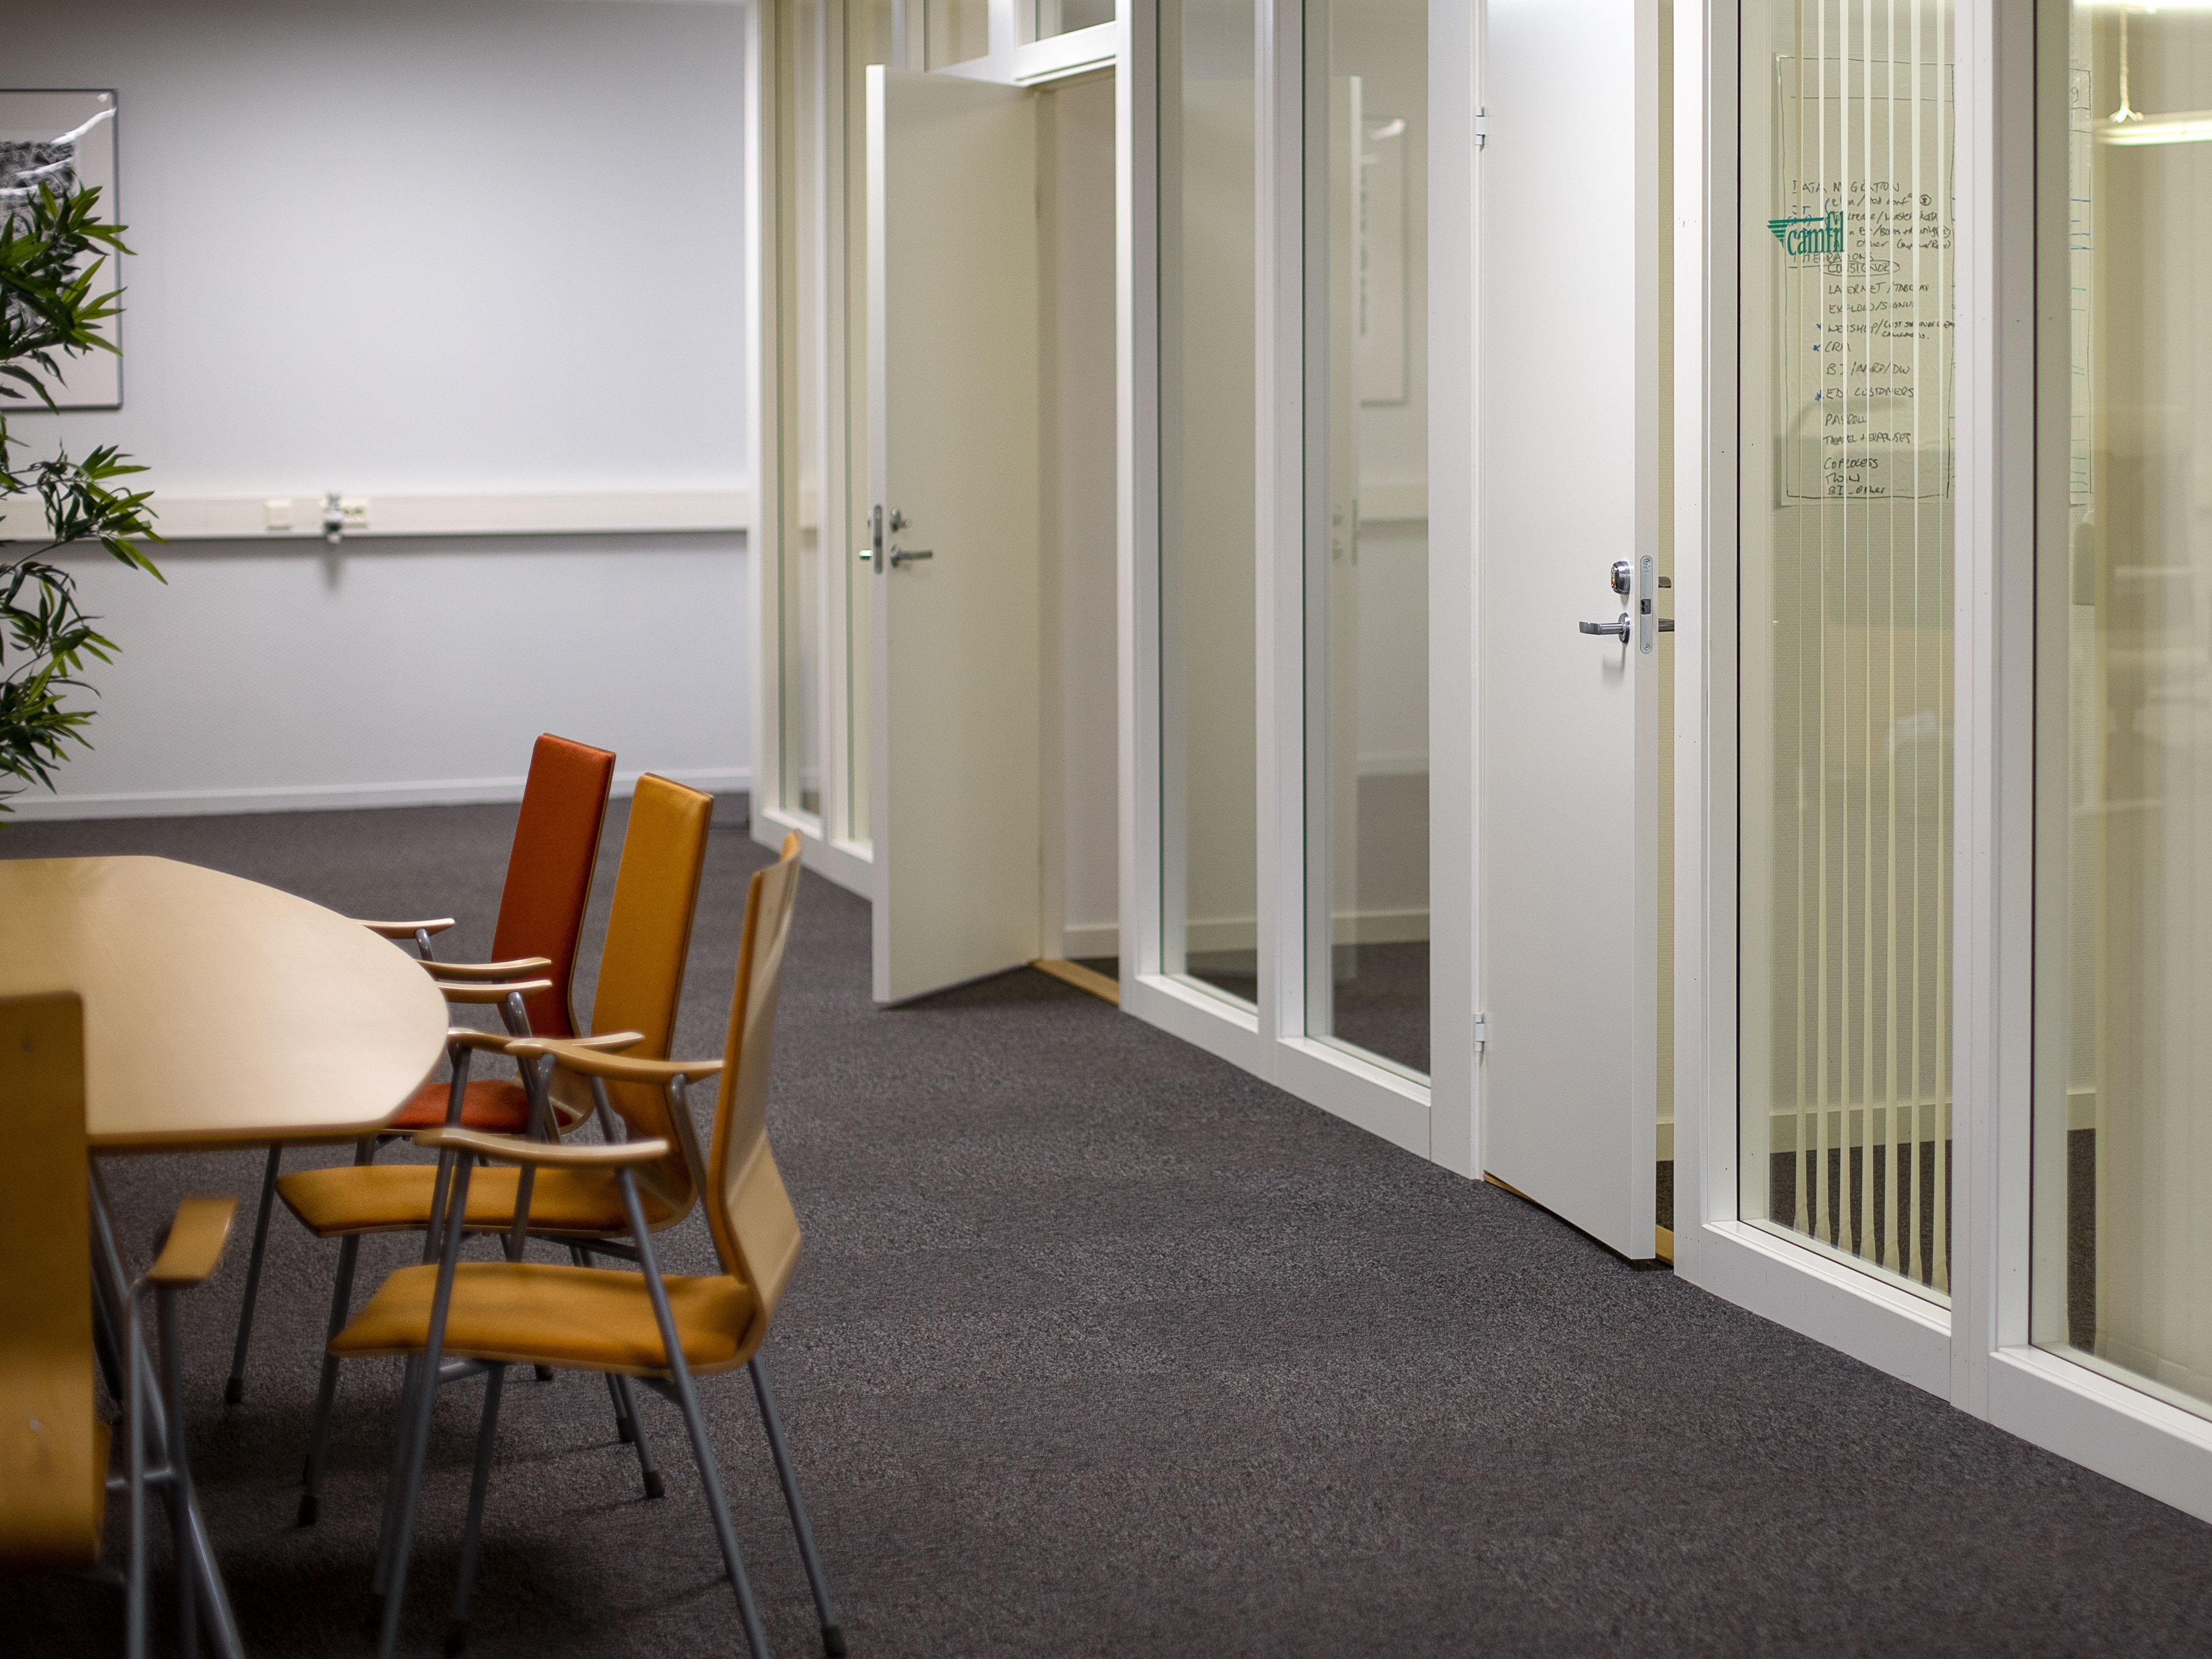 lokaler o kontor bild 3